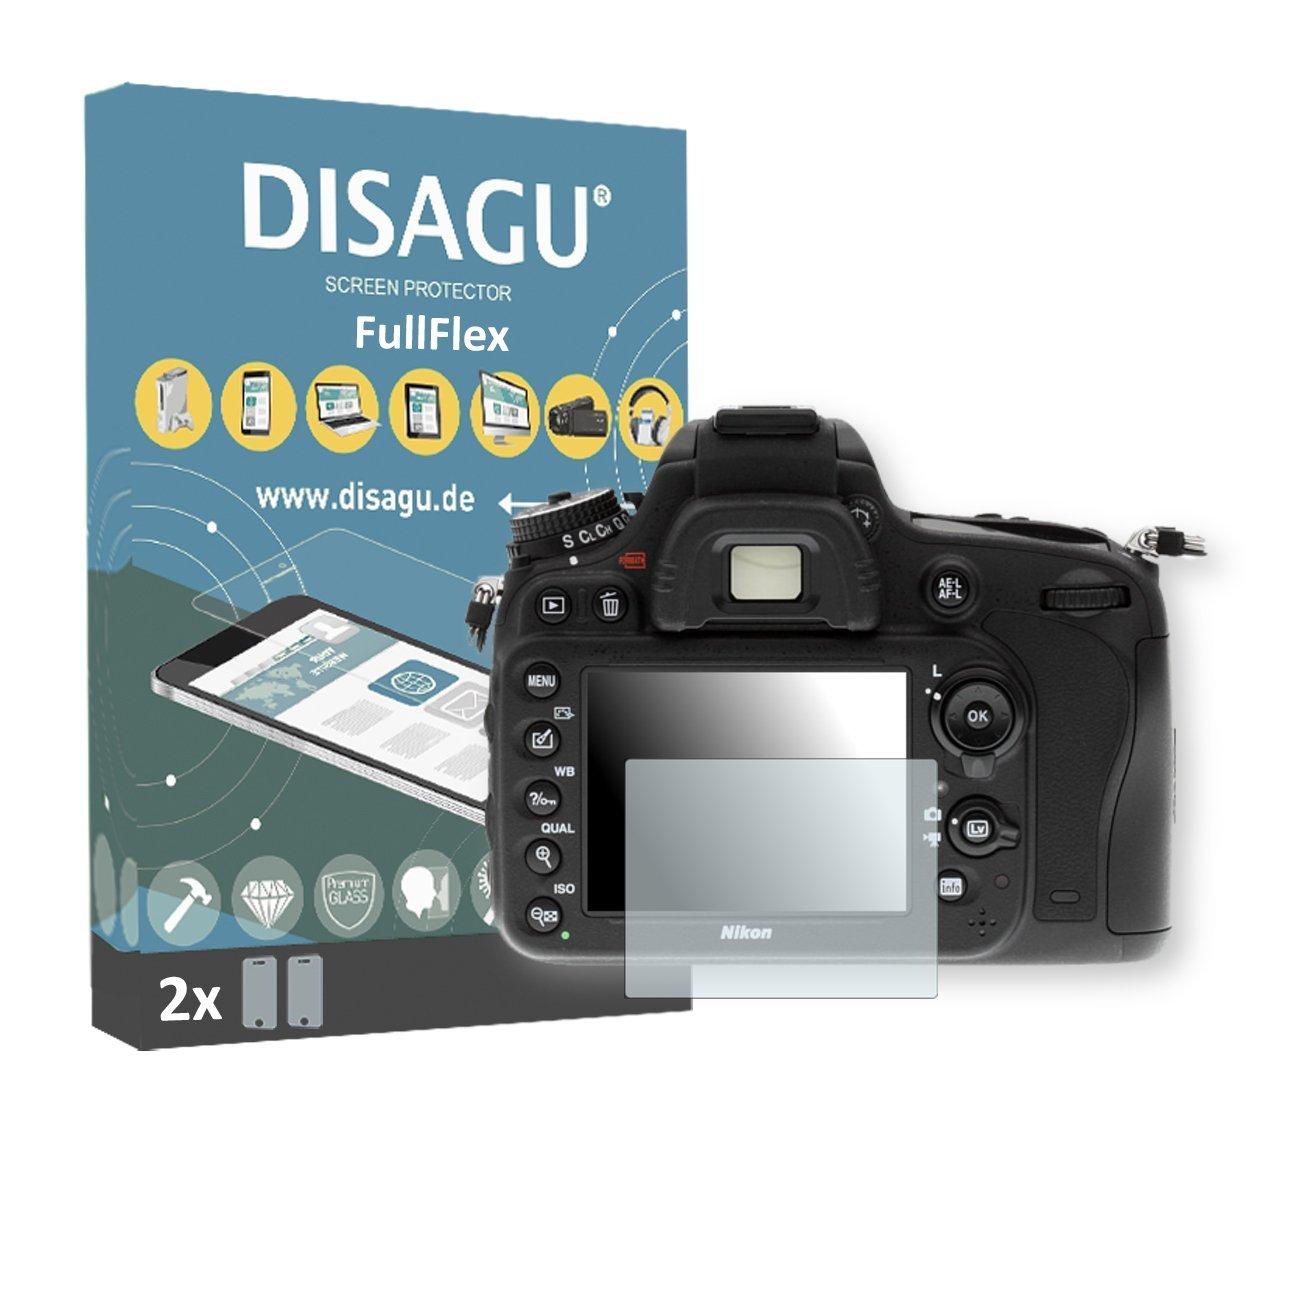 2 x Disagu FullFlex screen protector for Nikon D610 foil screen protector